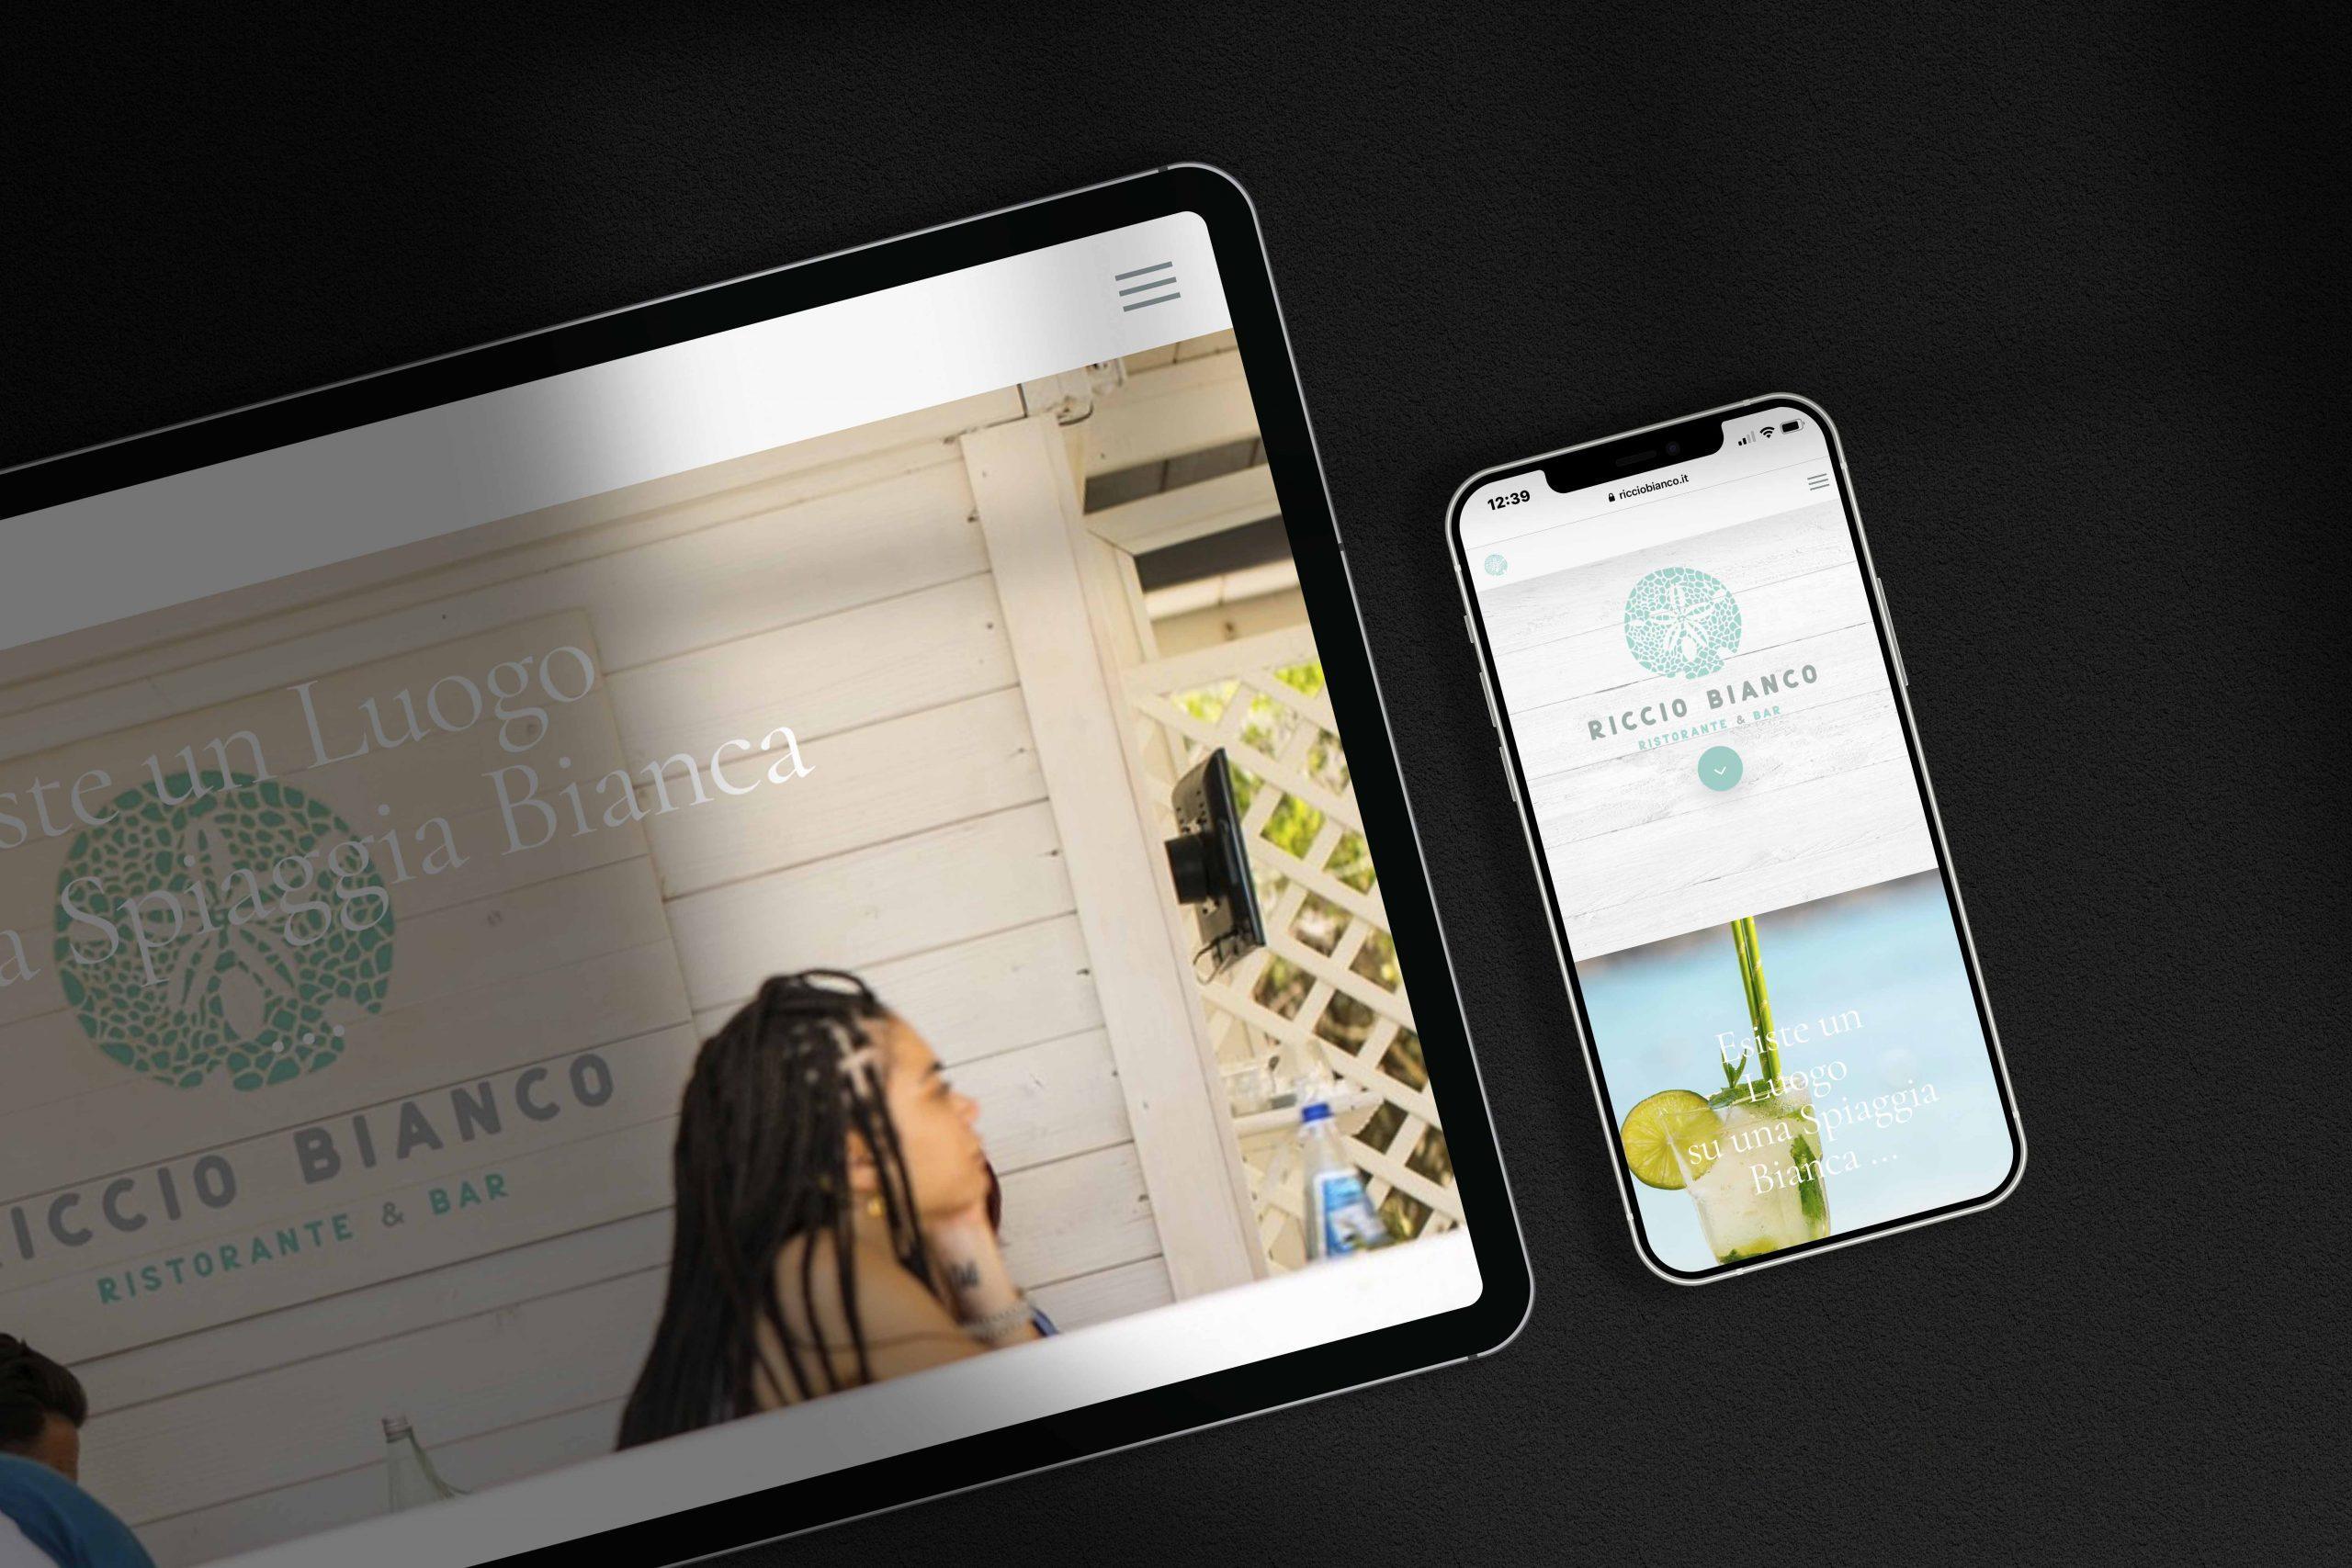 Riccio Bianco Portfolio Do Business Italy